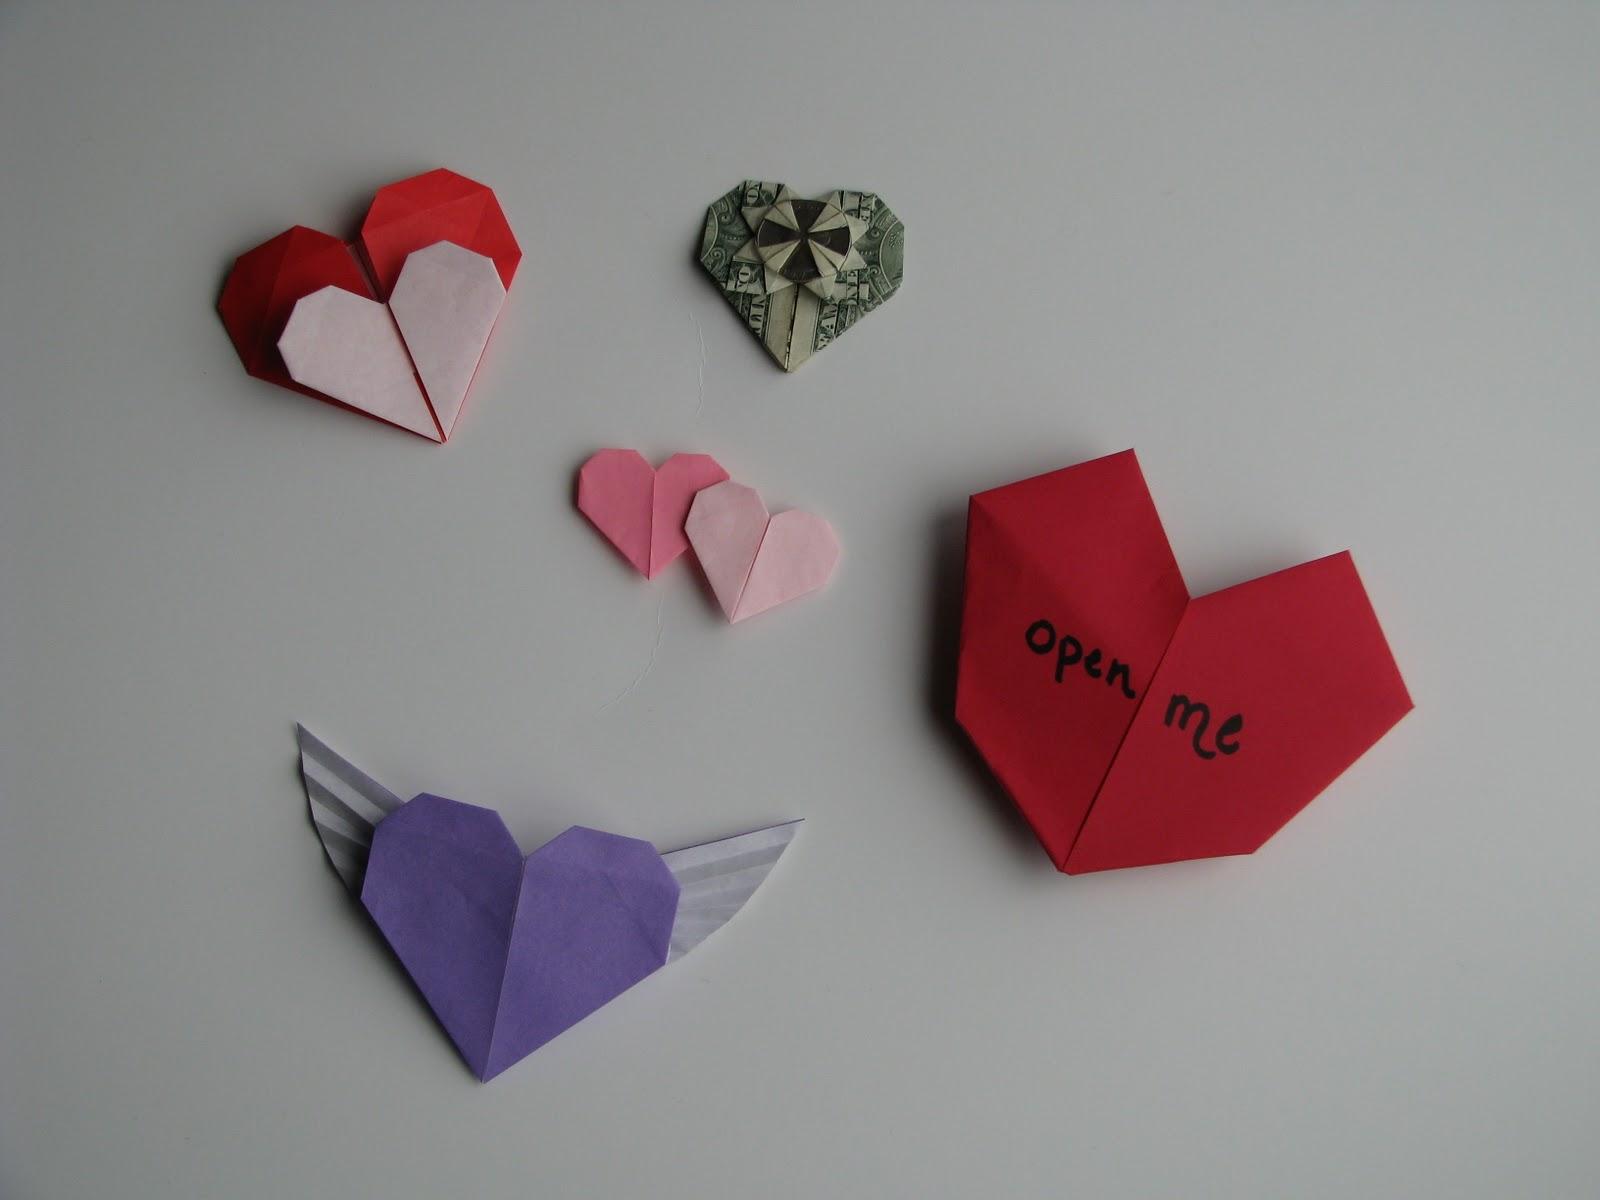 Origami Heart Christmas Origami Videos